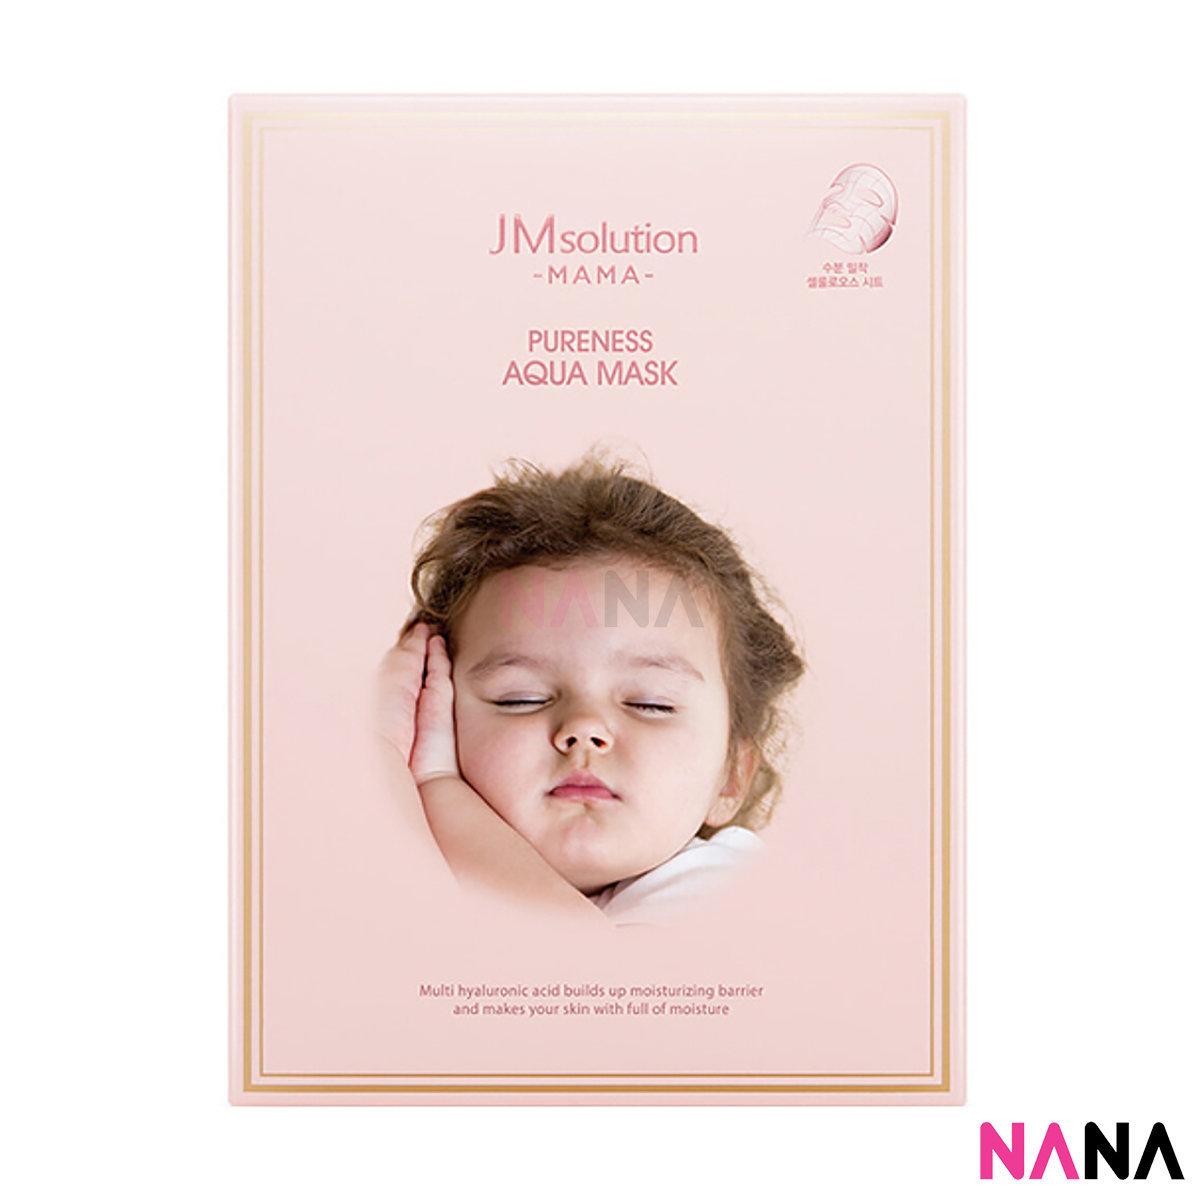 MAMA Pureness Aqua Mask (10 Sheets/ Box)